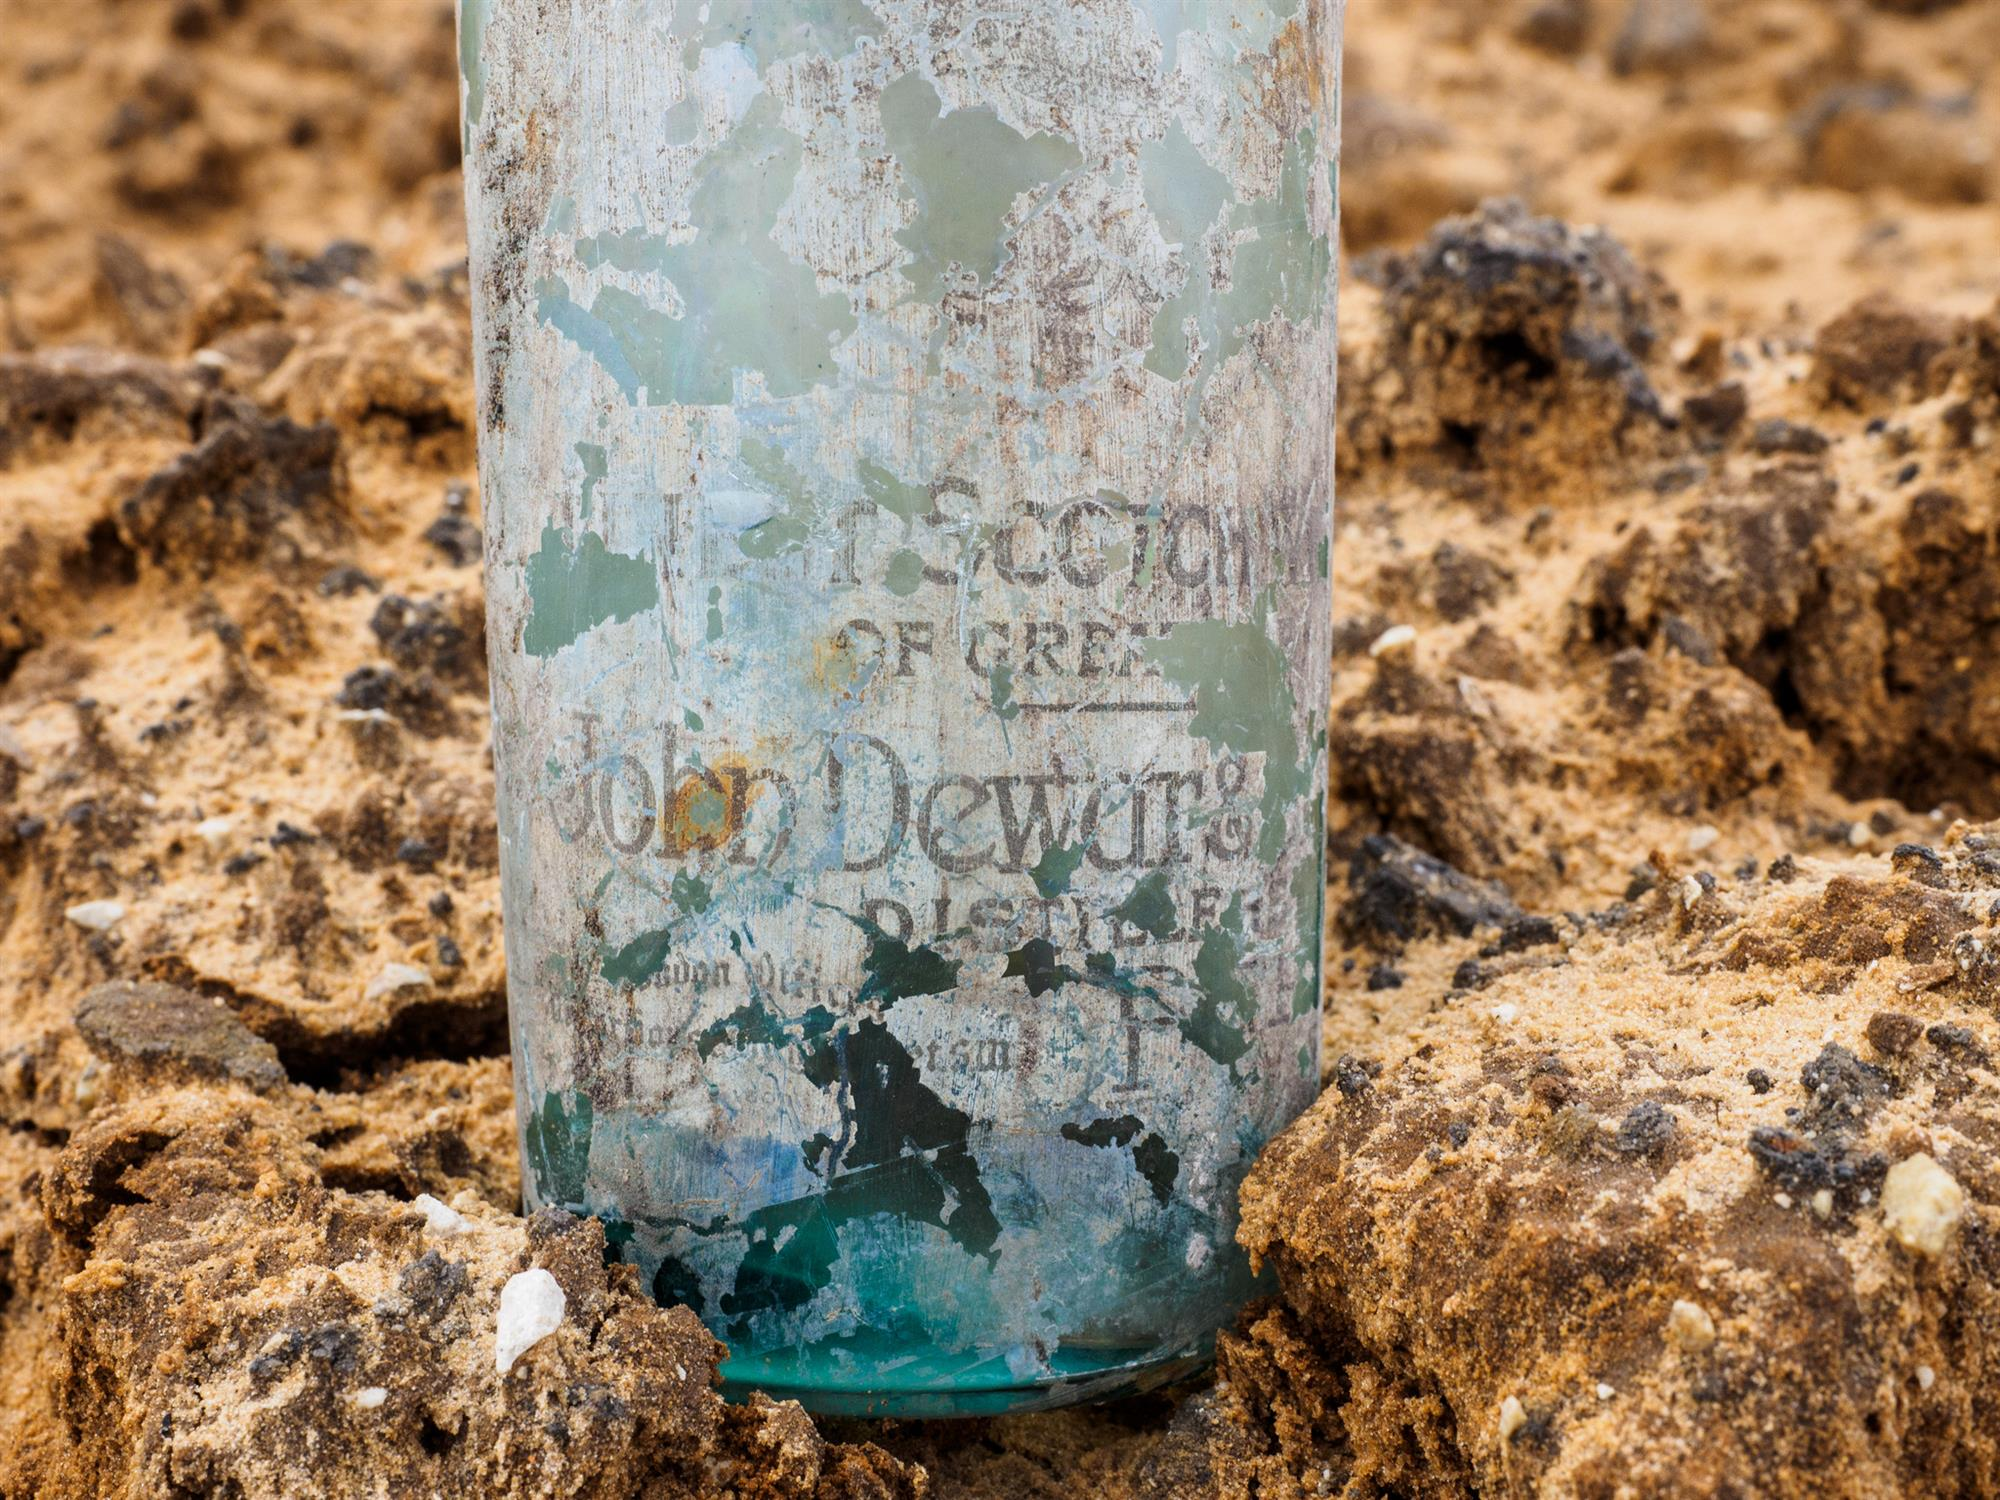 Botella de Dewar's